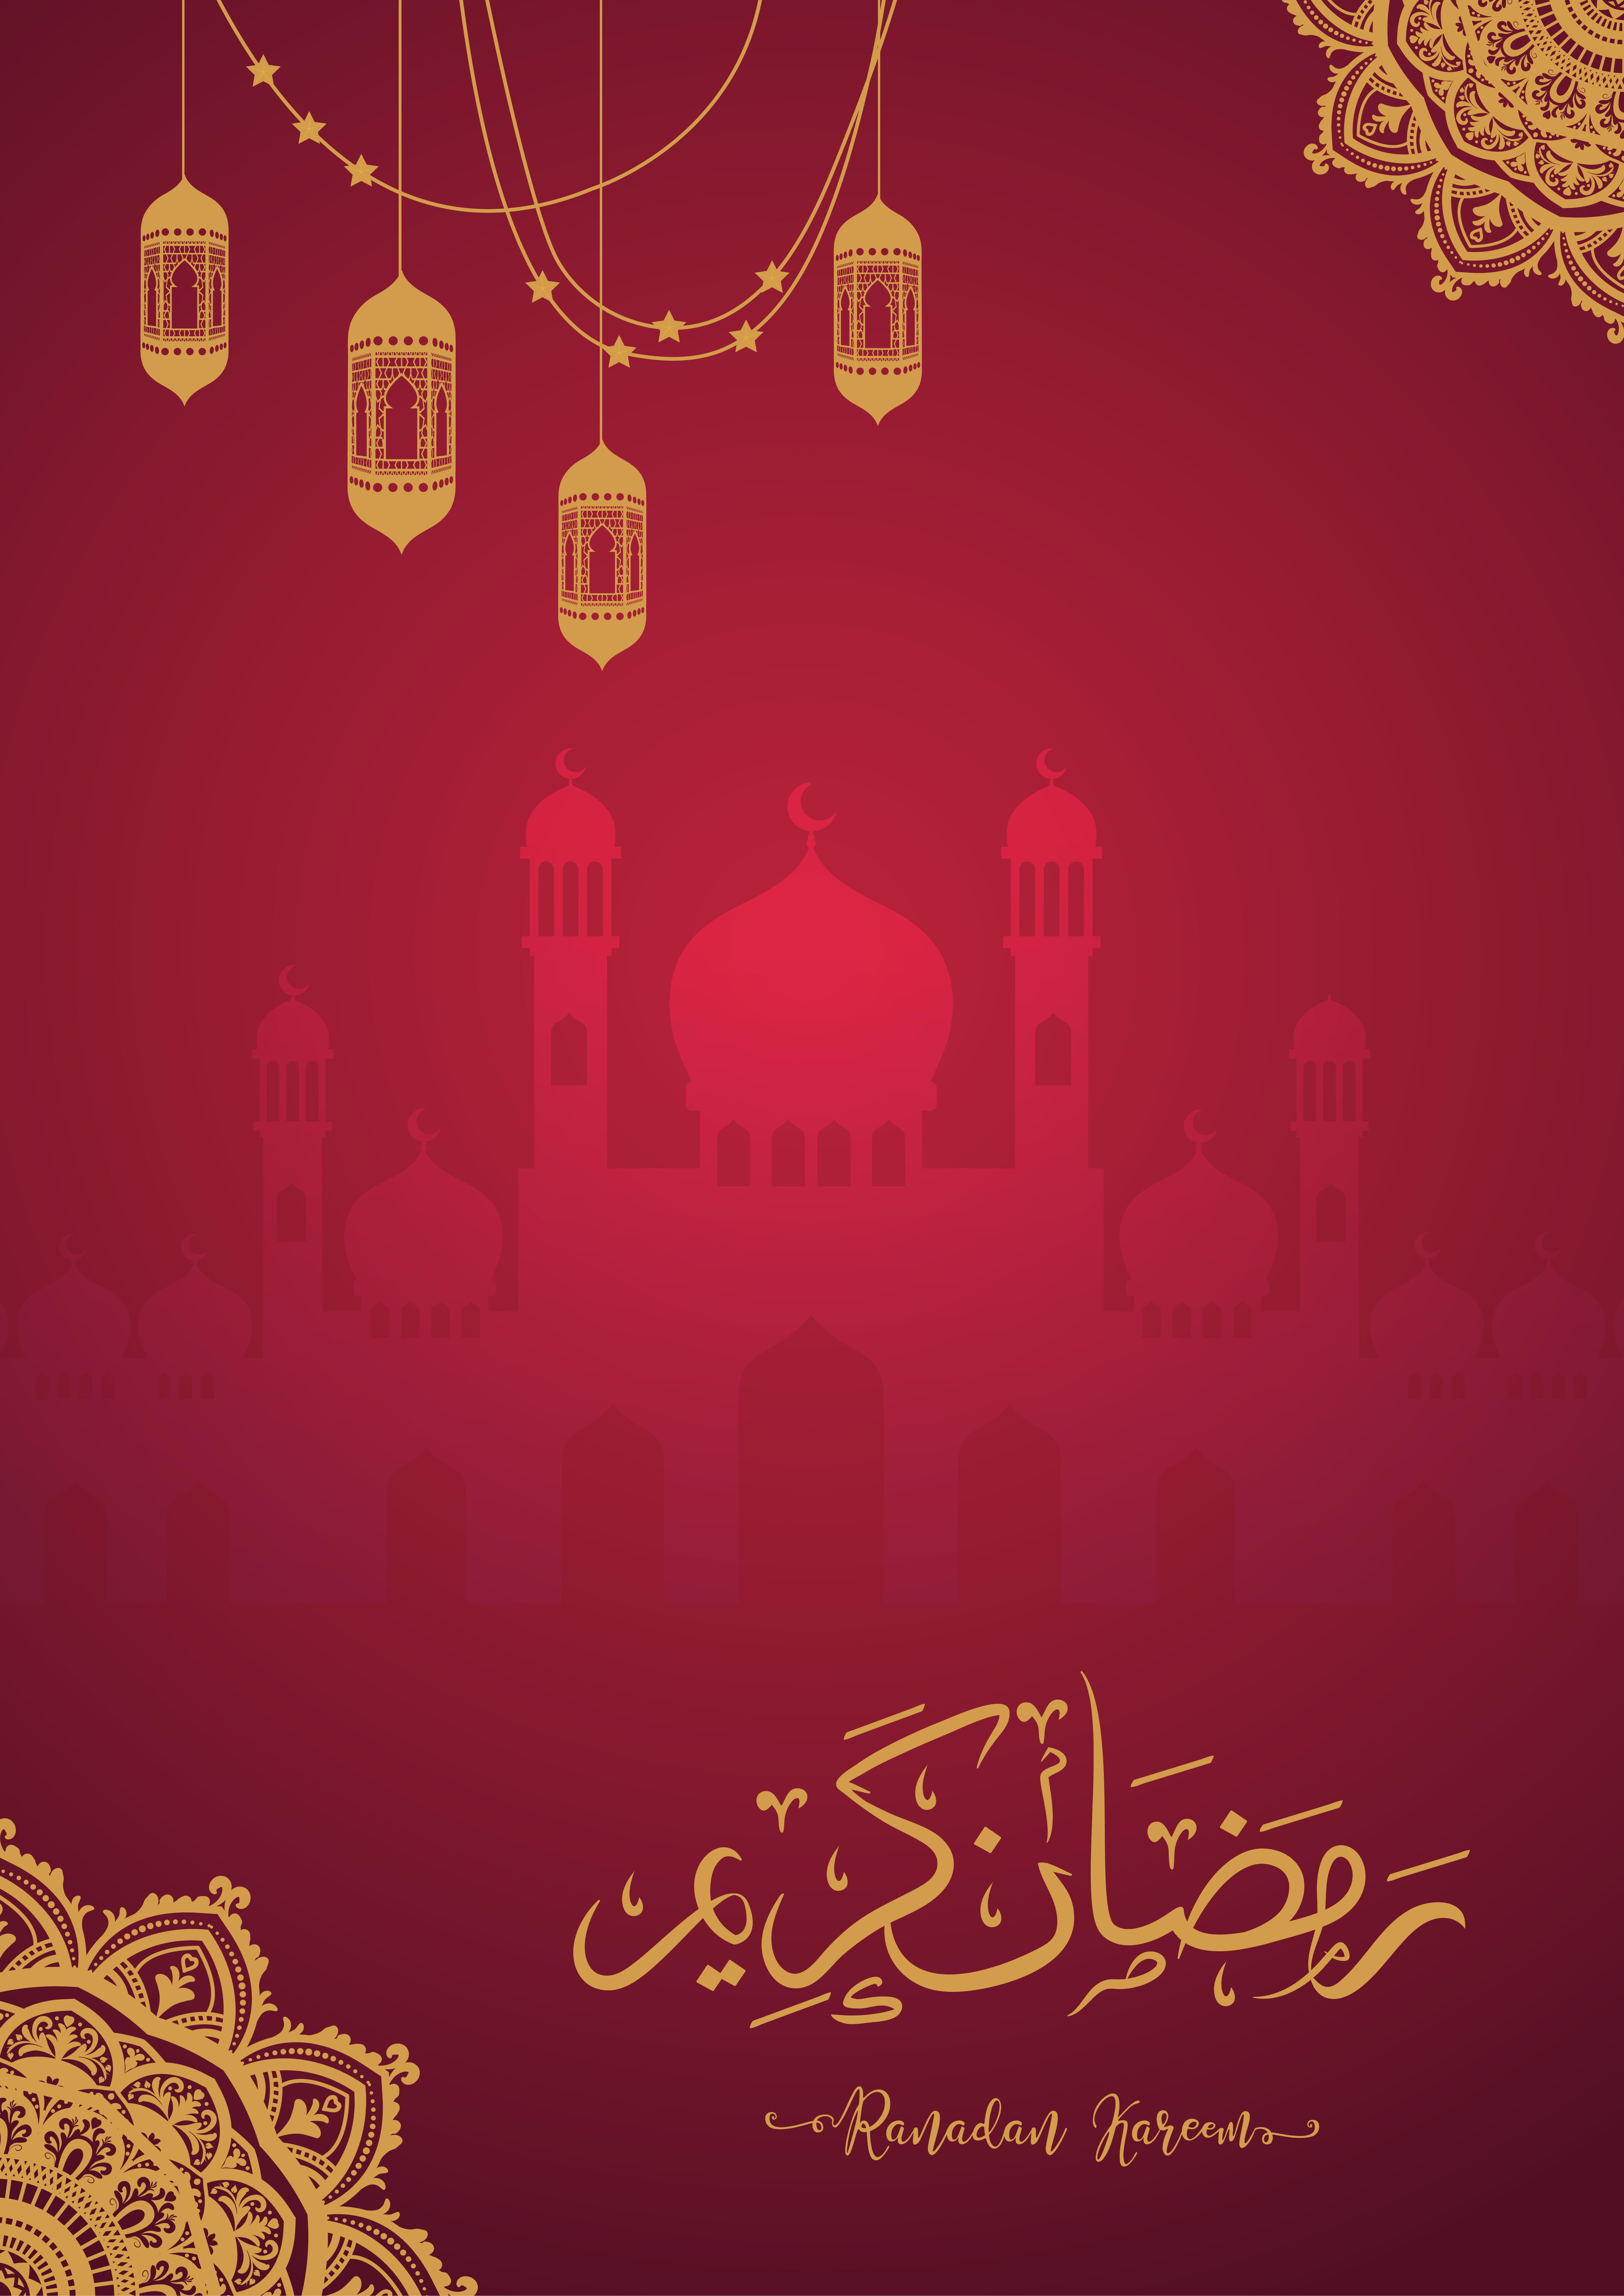 Ramadan Kareem Or Eid Mubarak Greeting Background 671475 Vector Art At Vecteezy